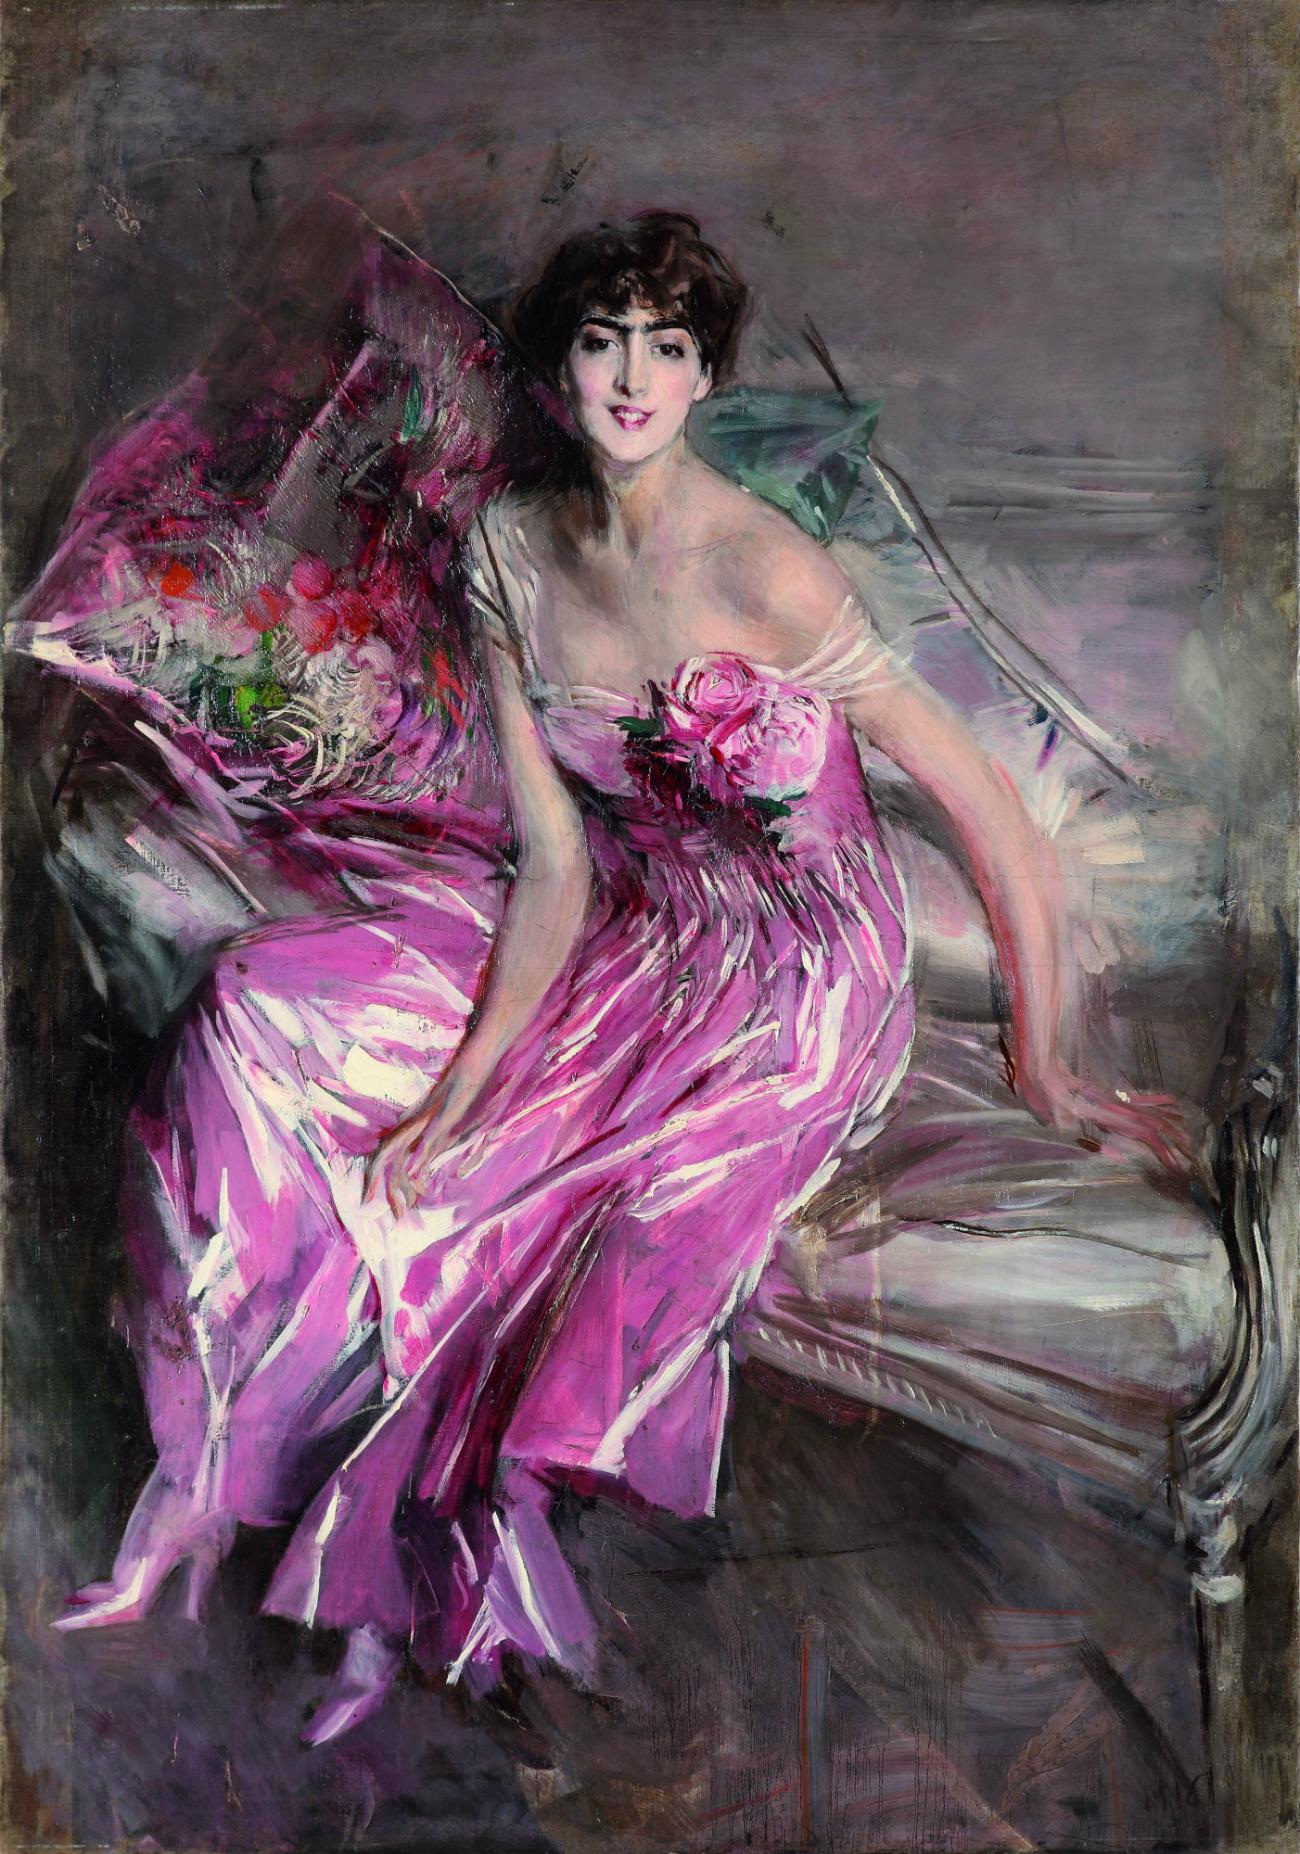 Дама в розовом (Портрет Оливии де Суберказо Конча). 1916. © Музей Джованни Больдини, Феррара